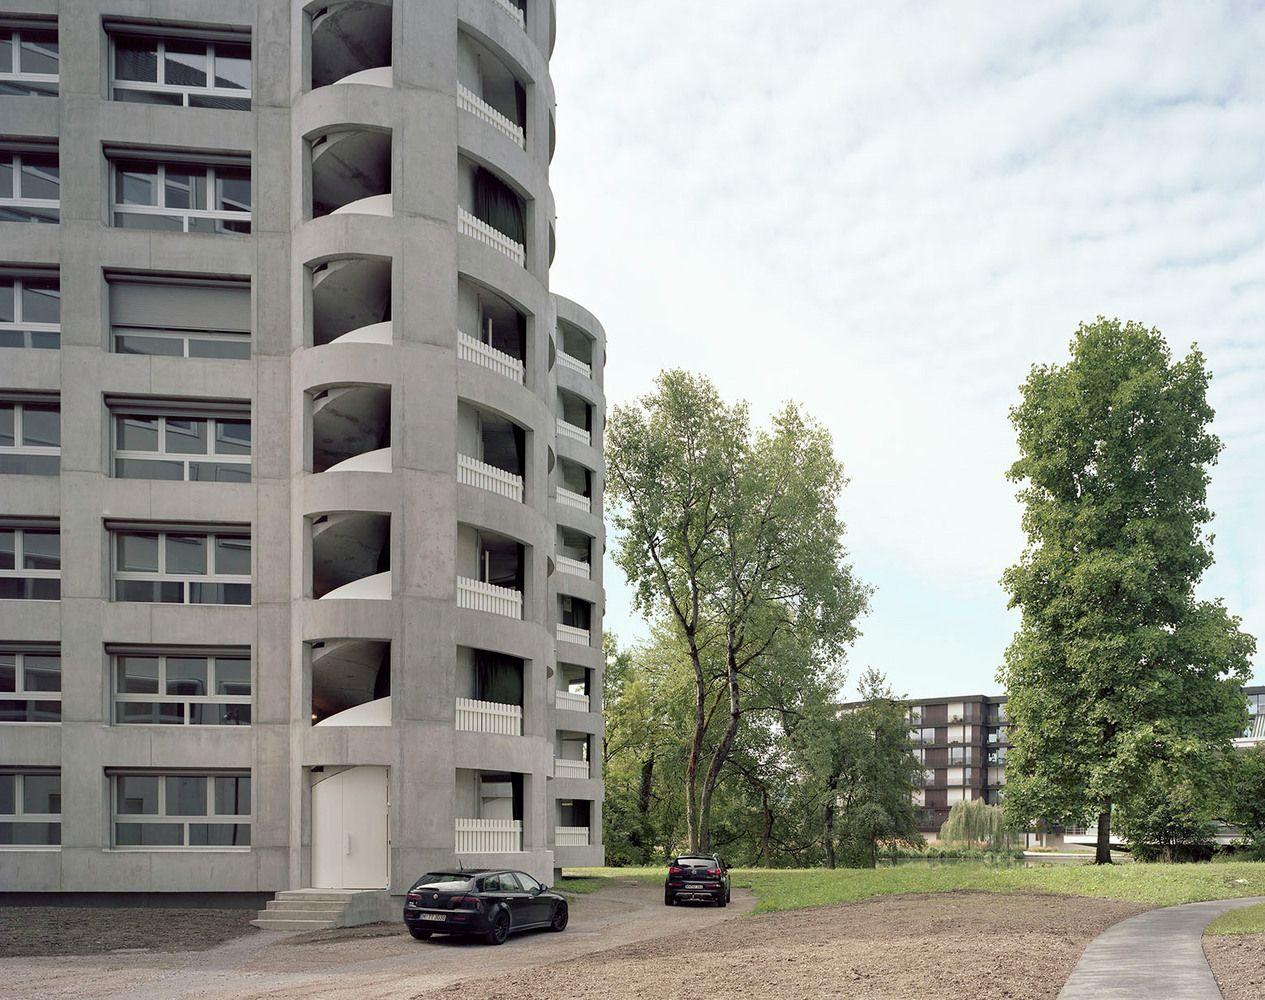 gallery of zellwegerpark uster / herzog & de meuron - 2, Innenarchitektur ideen